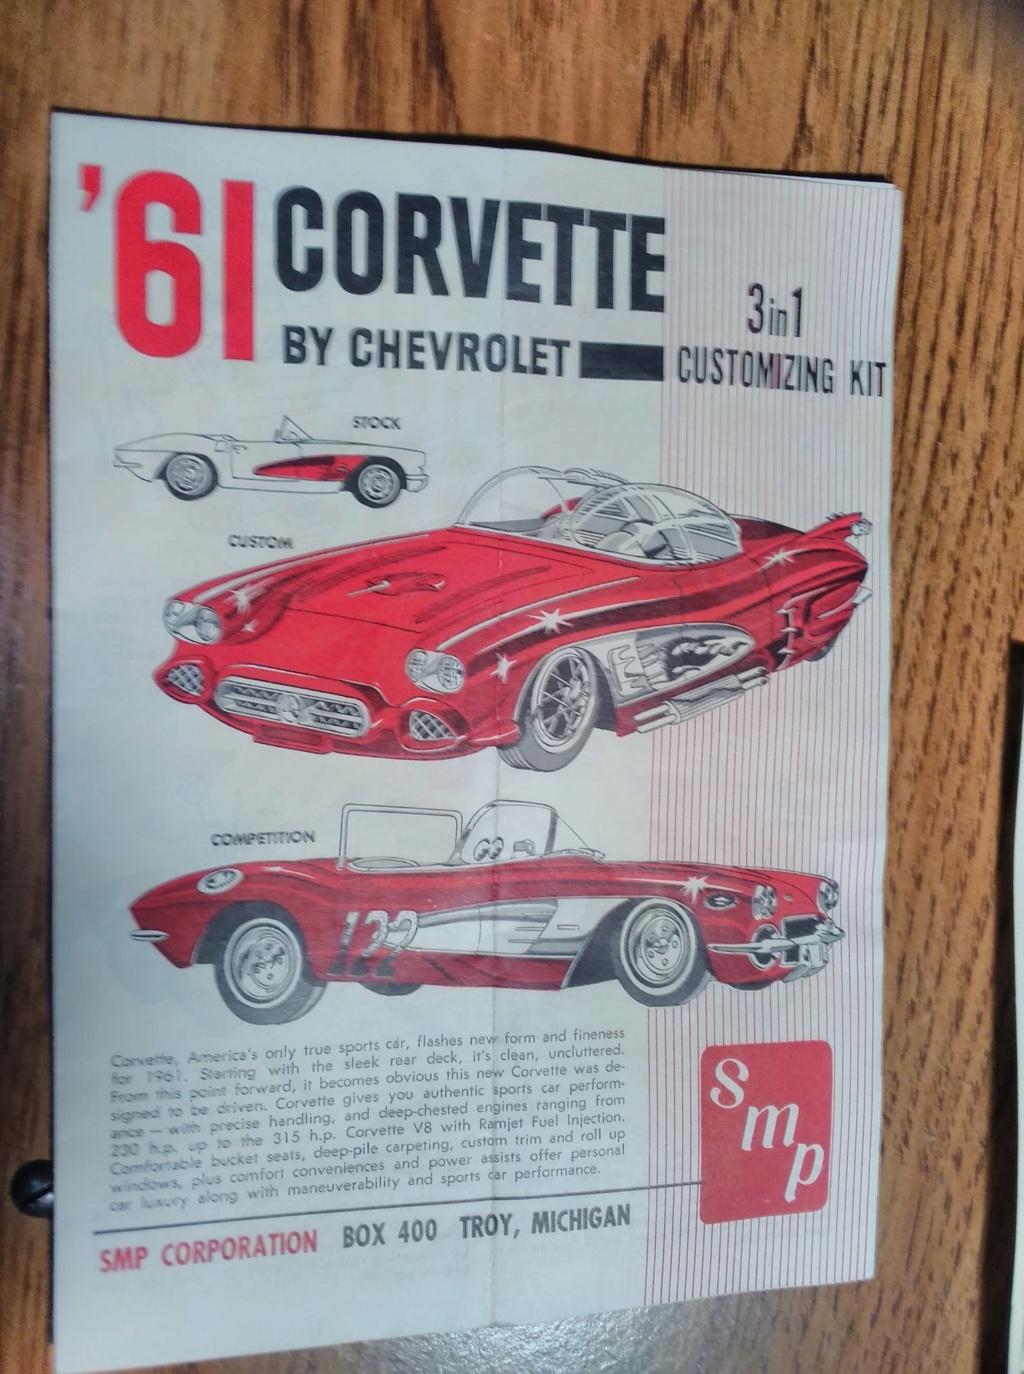 1961 Chevrolet Corvette Convertible - Amt customizing kit  17266310